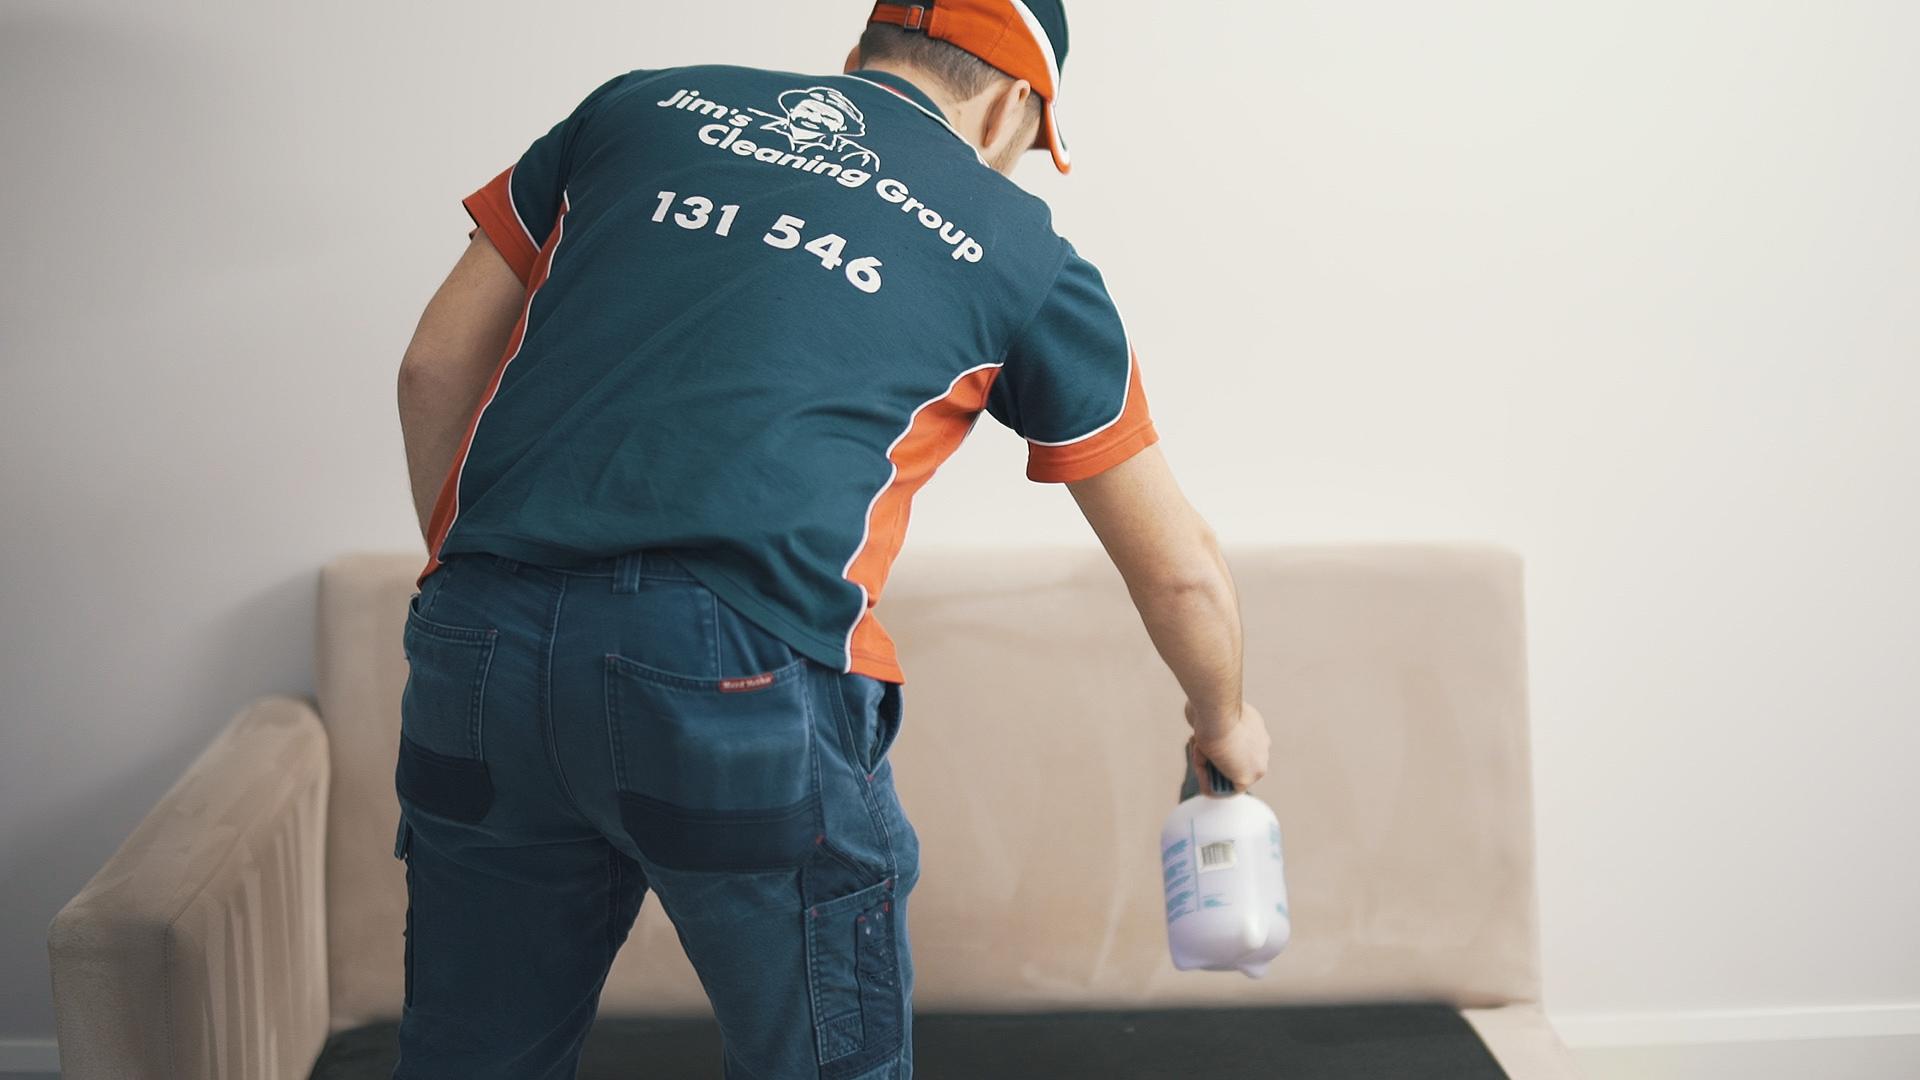 Jim's Carpet Cleaning Sydenham